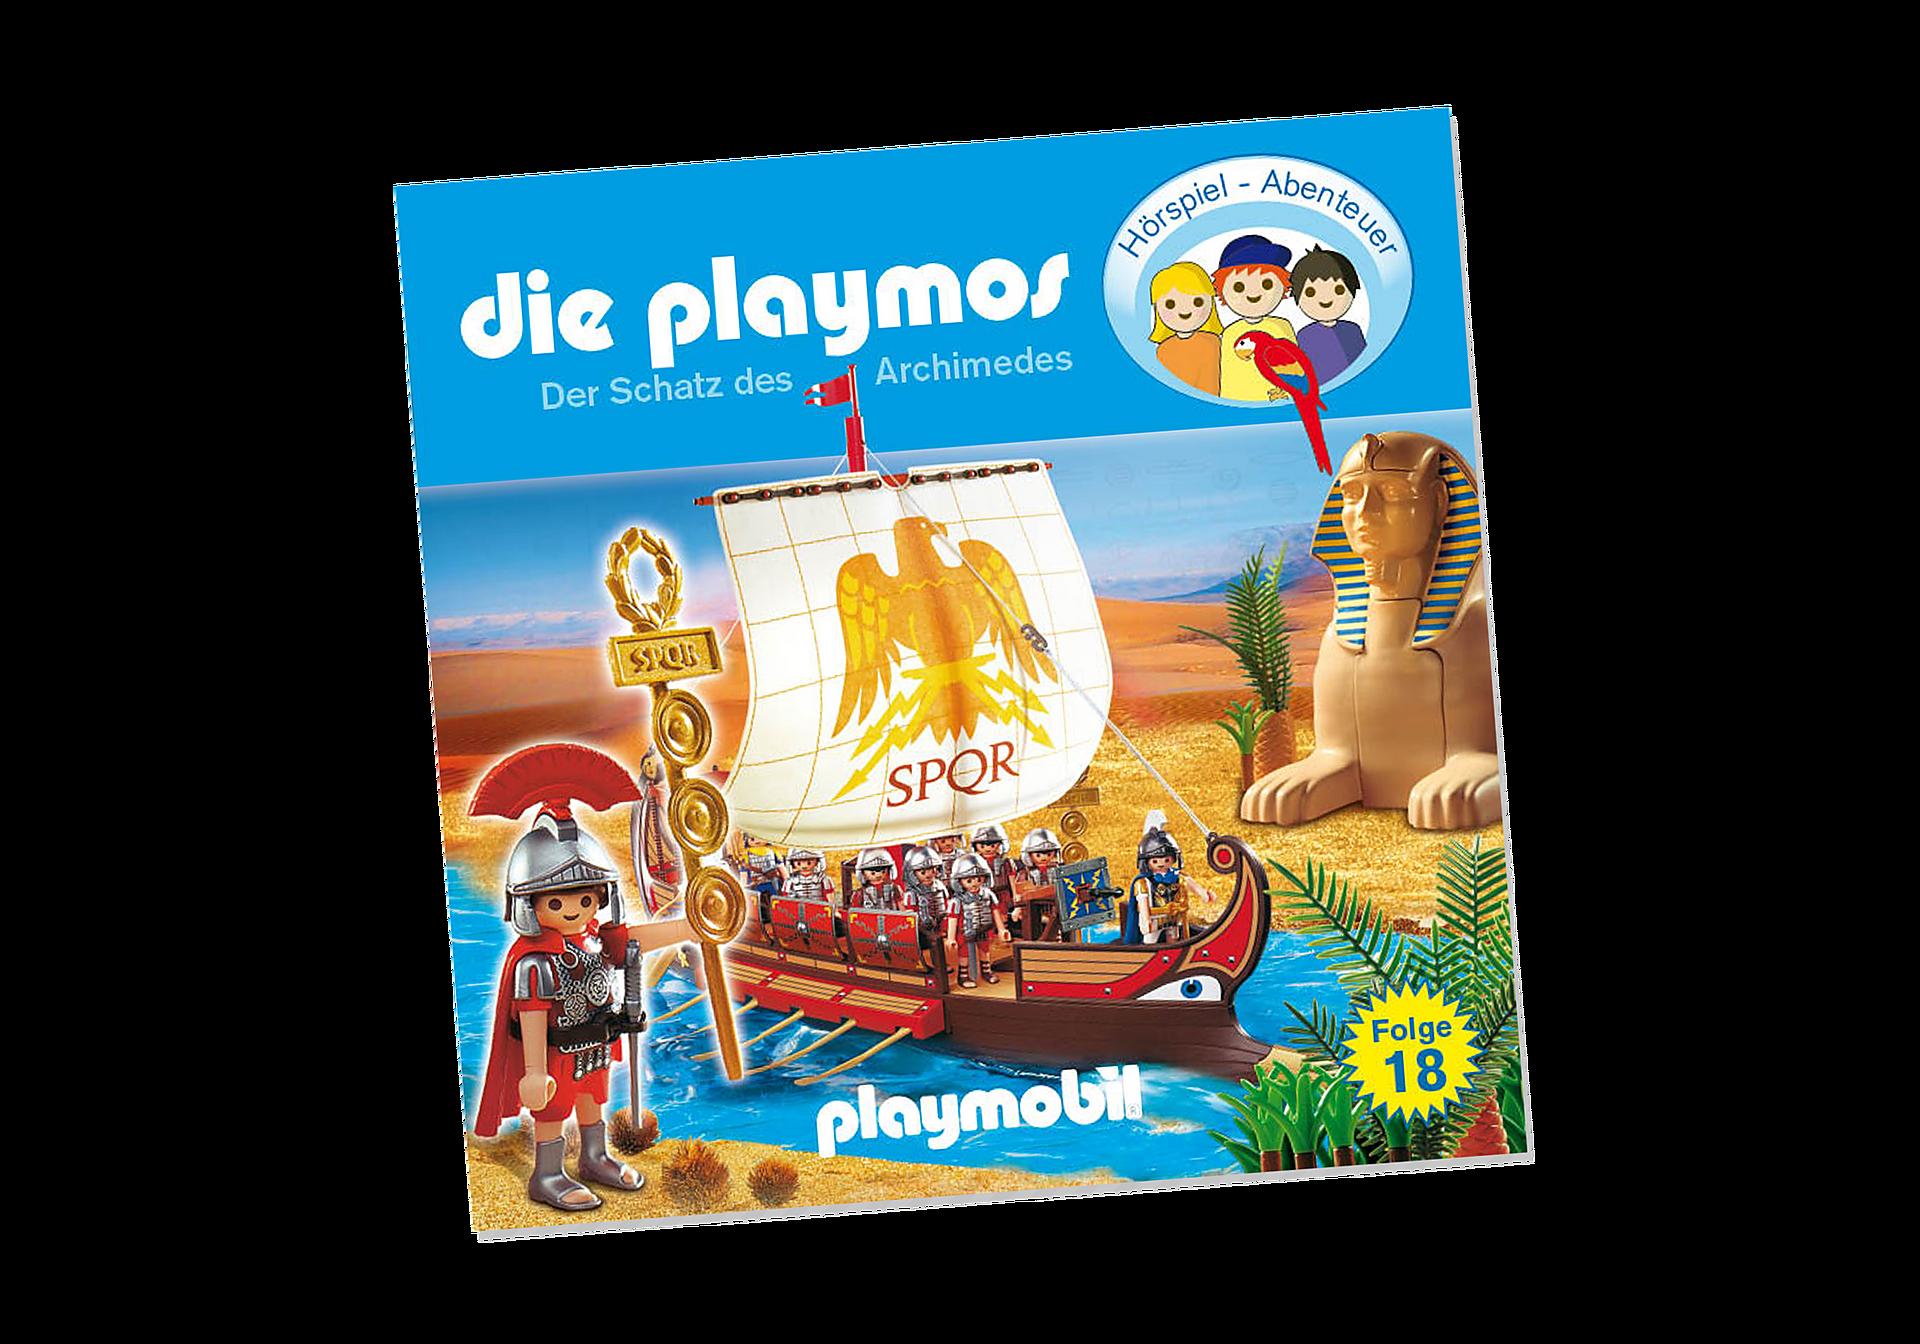 http://media.playmobil.com/i/playmobil/80271_product_detail/Der Schatz des Archimedes (18) - CD